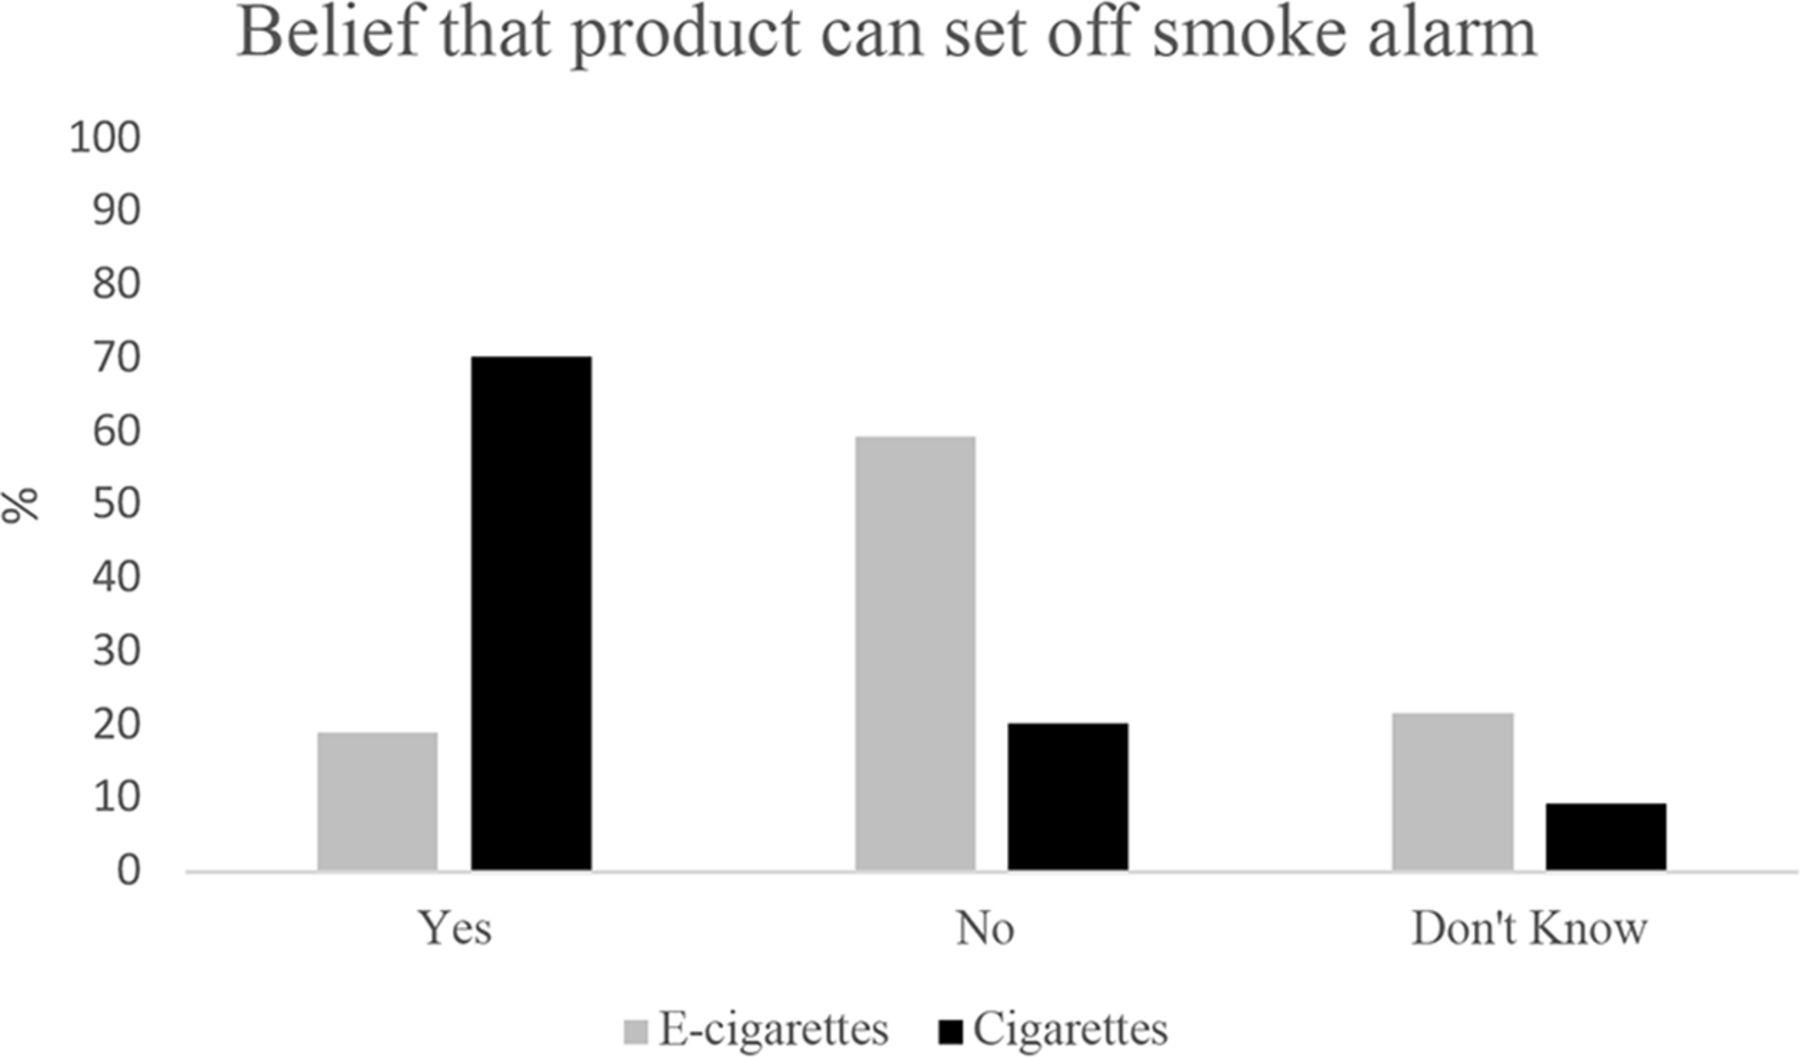 Indoor e-cigarette use can set off smoke detectors: perceptions of